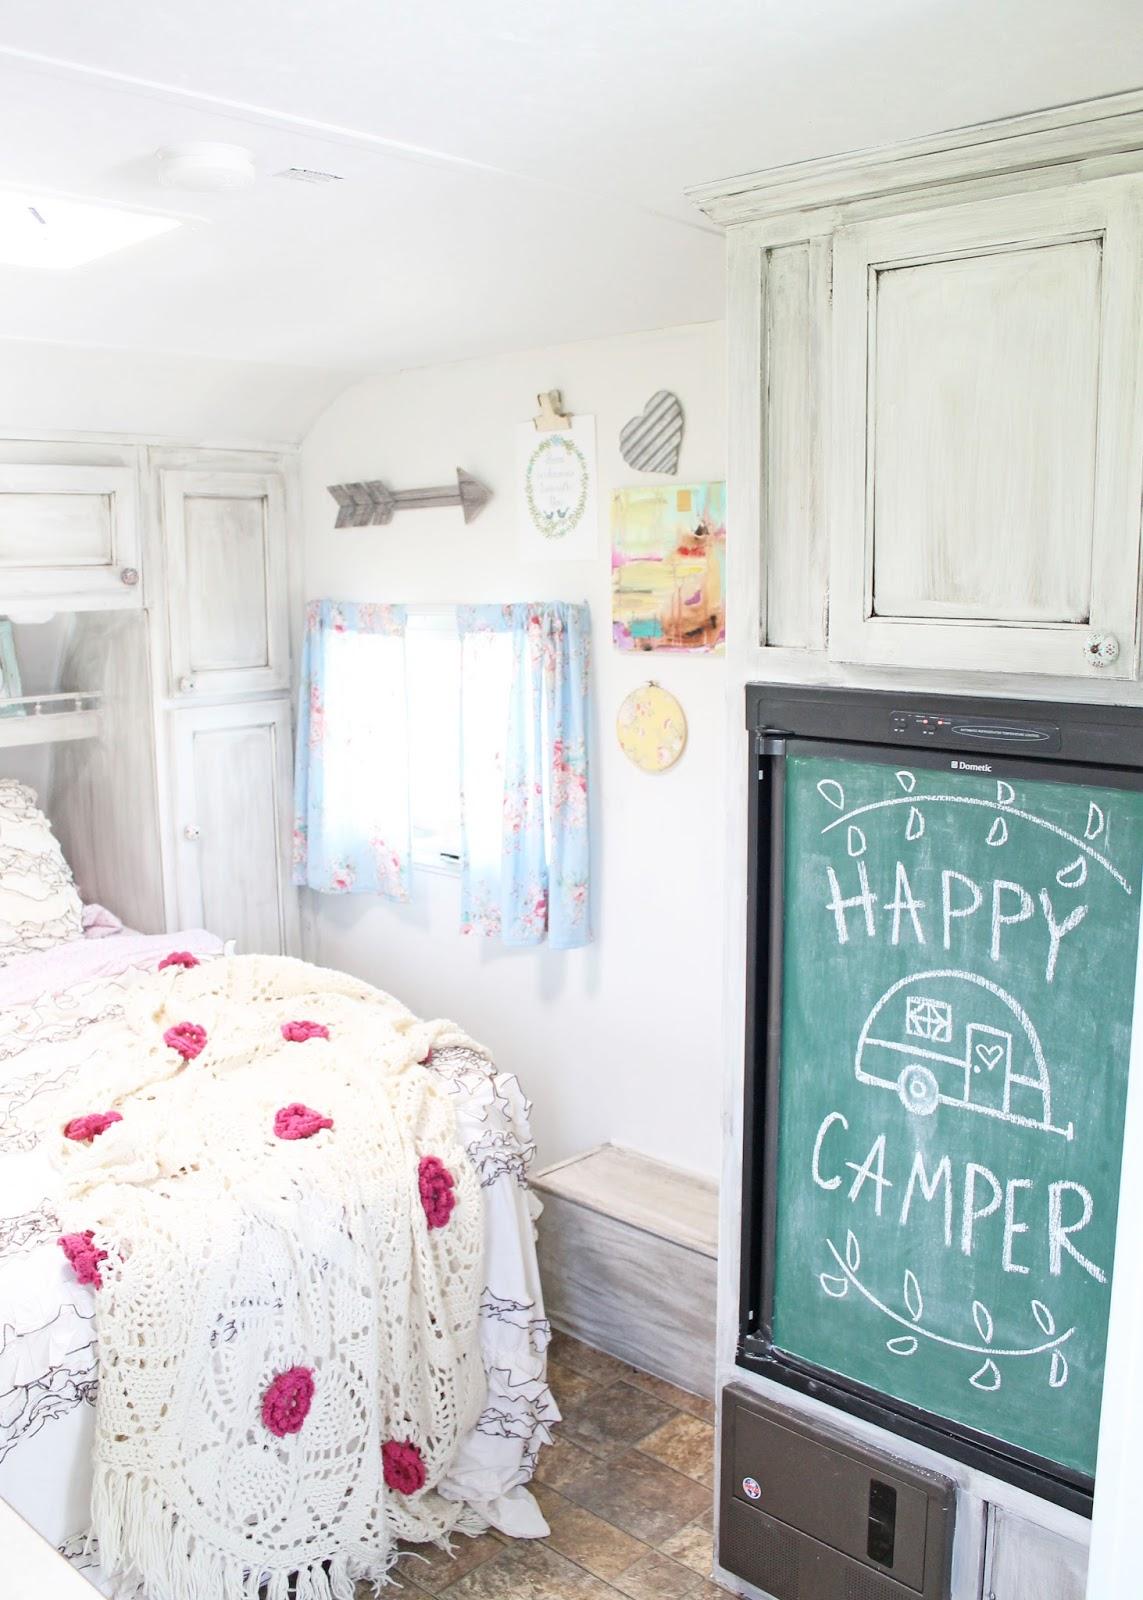 Brittany York's vintage style camper